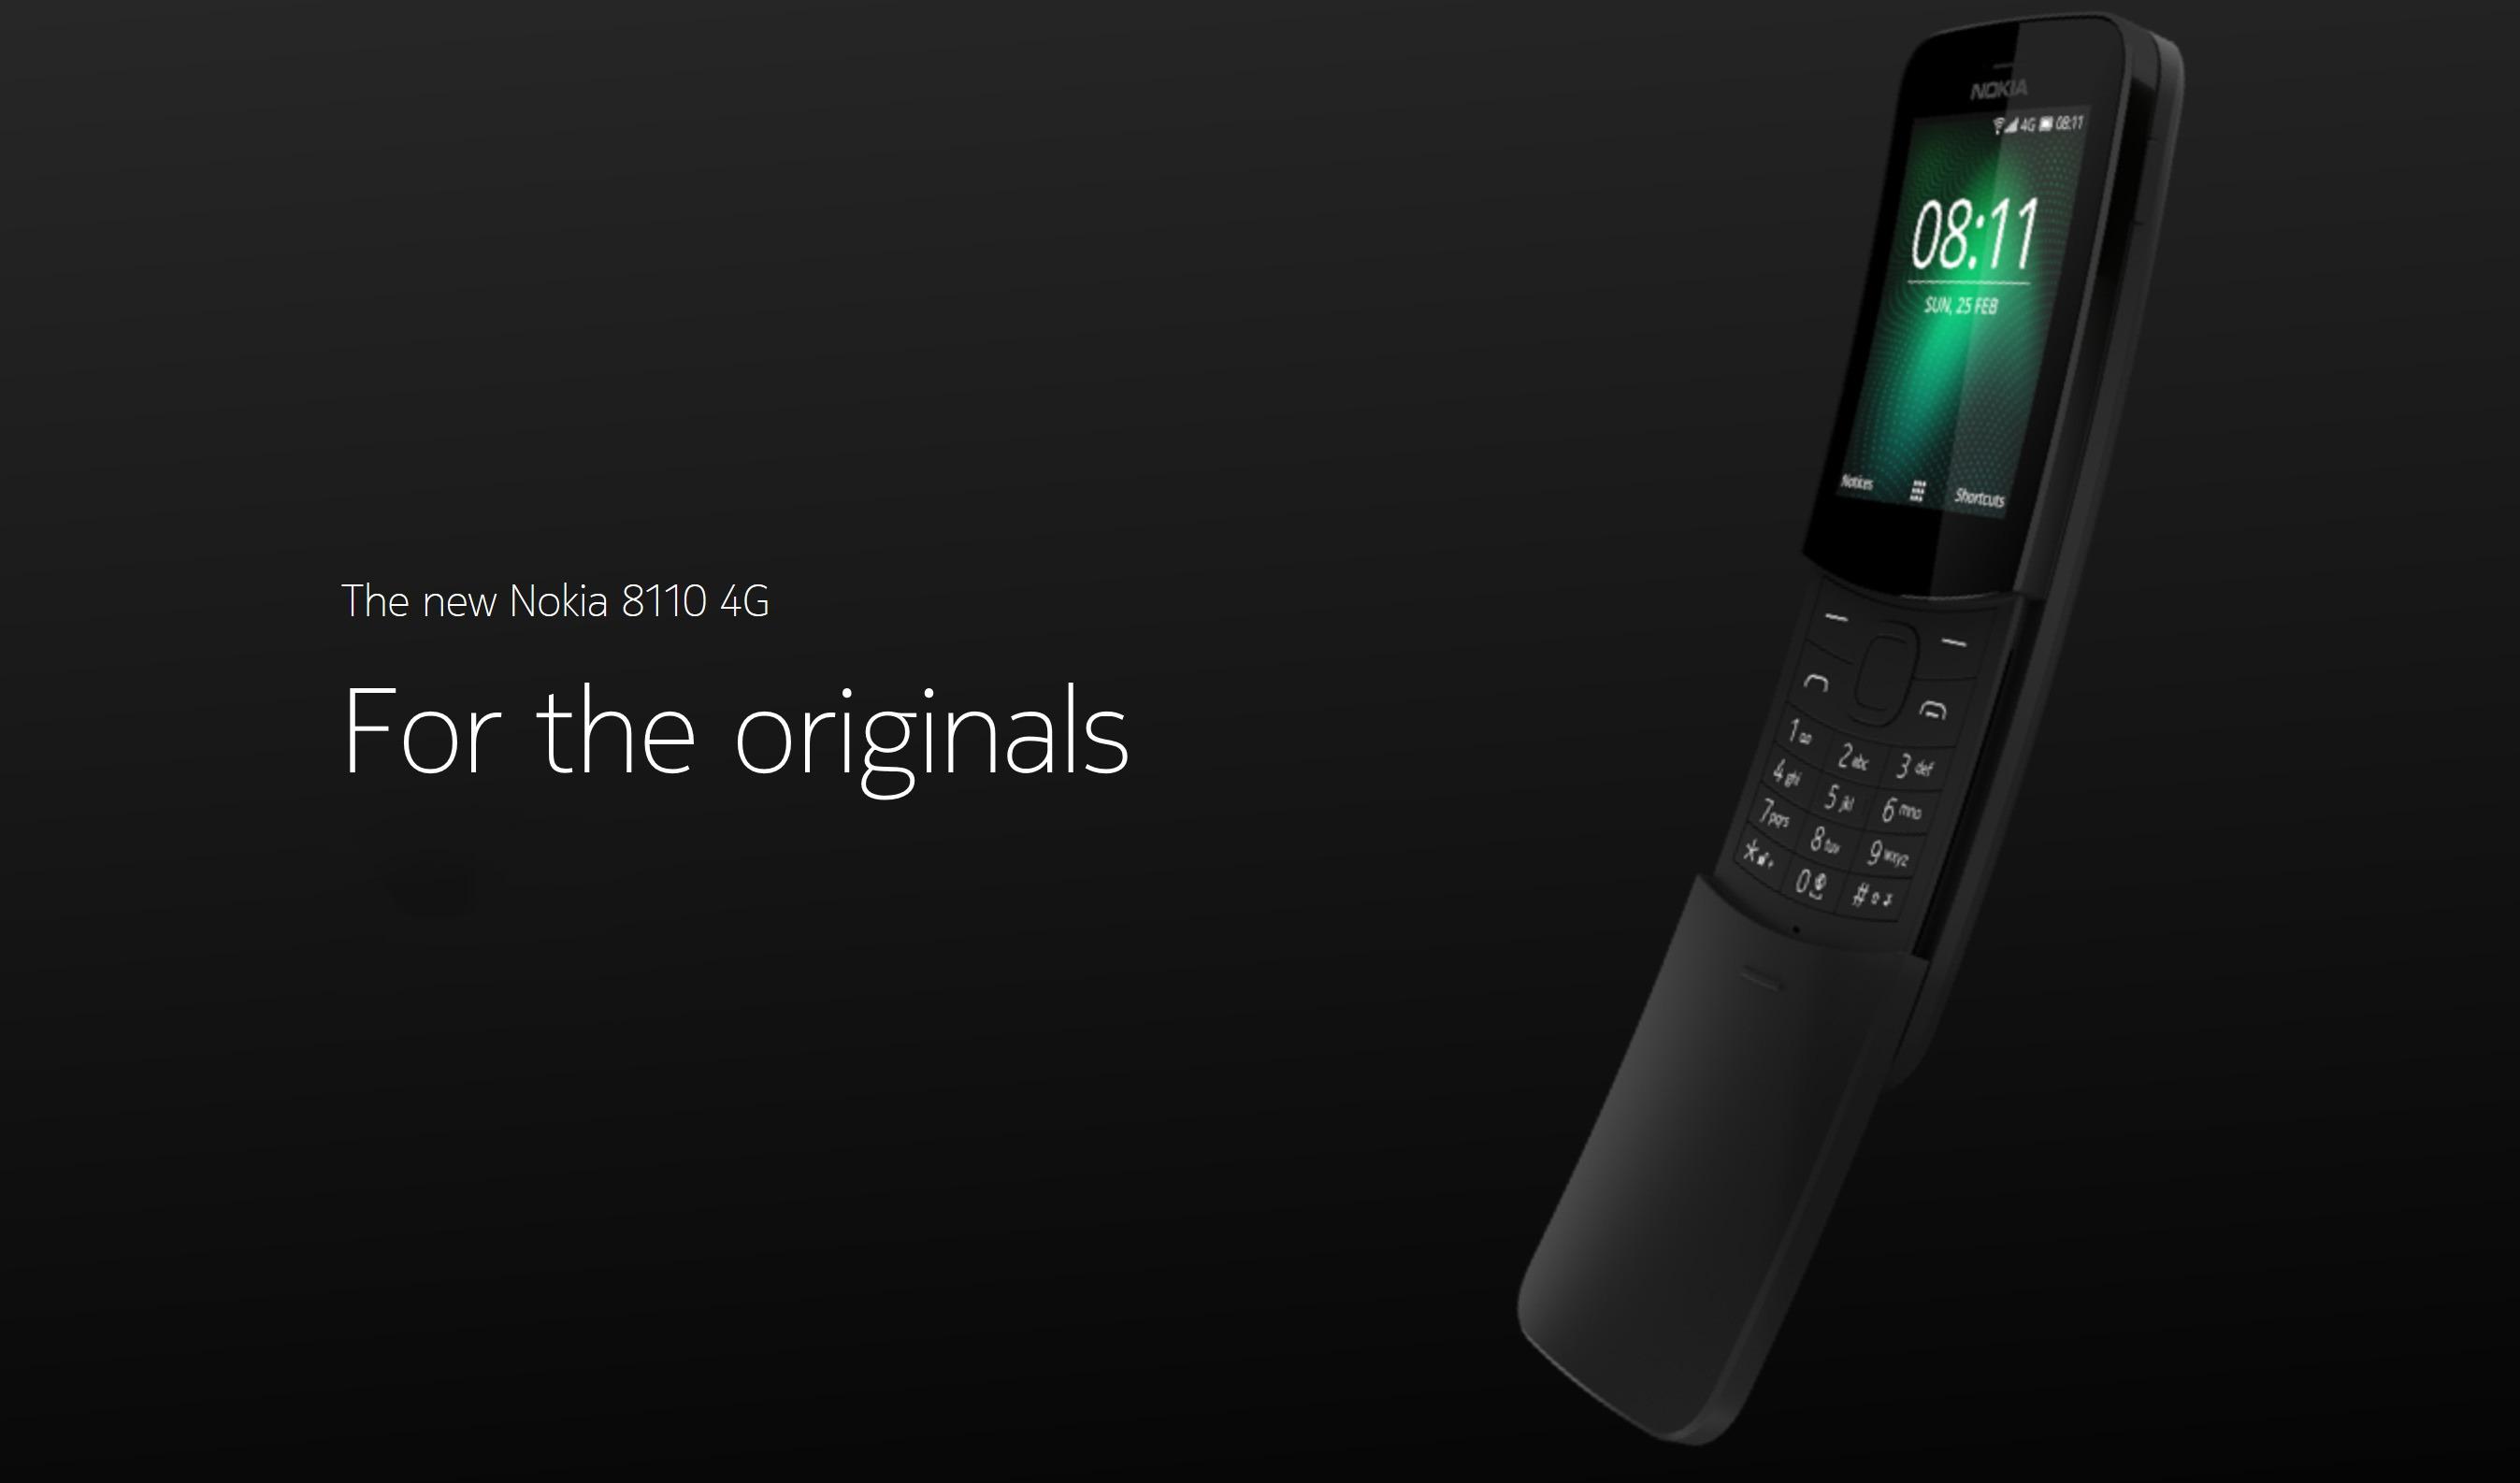 Nokia 8110 4G, la vuelta de un teléfono icónico modernizado [MWC18] 1